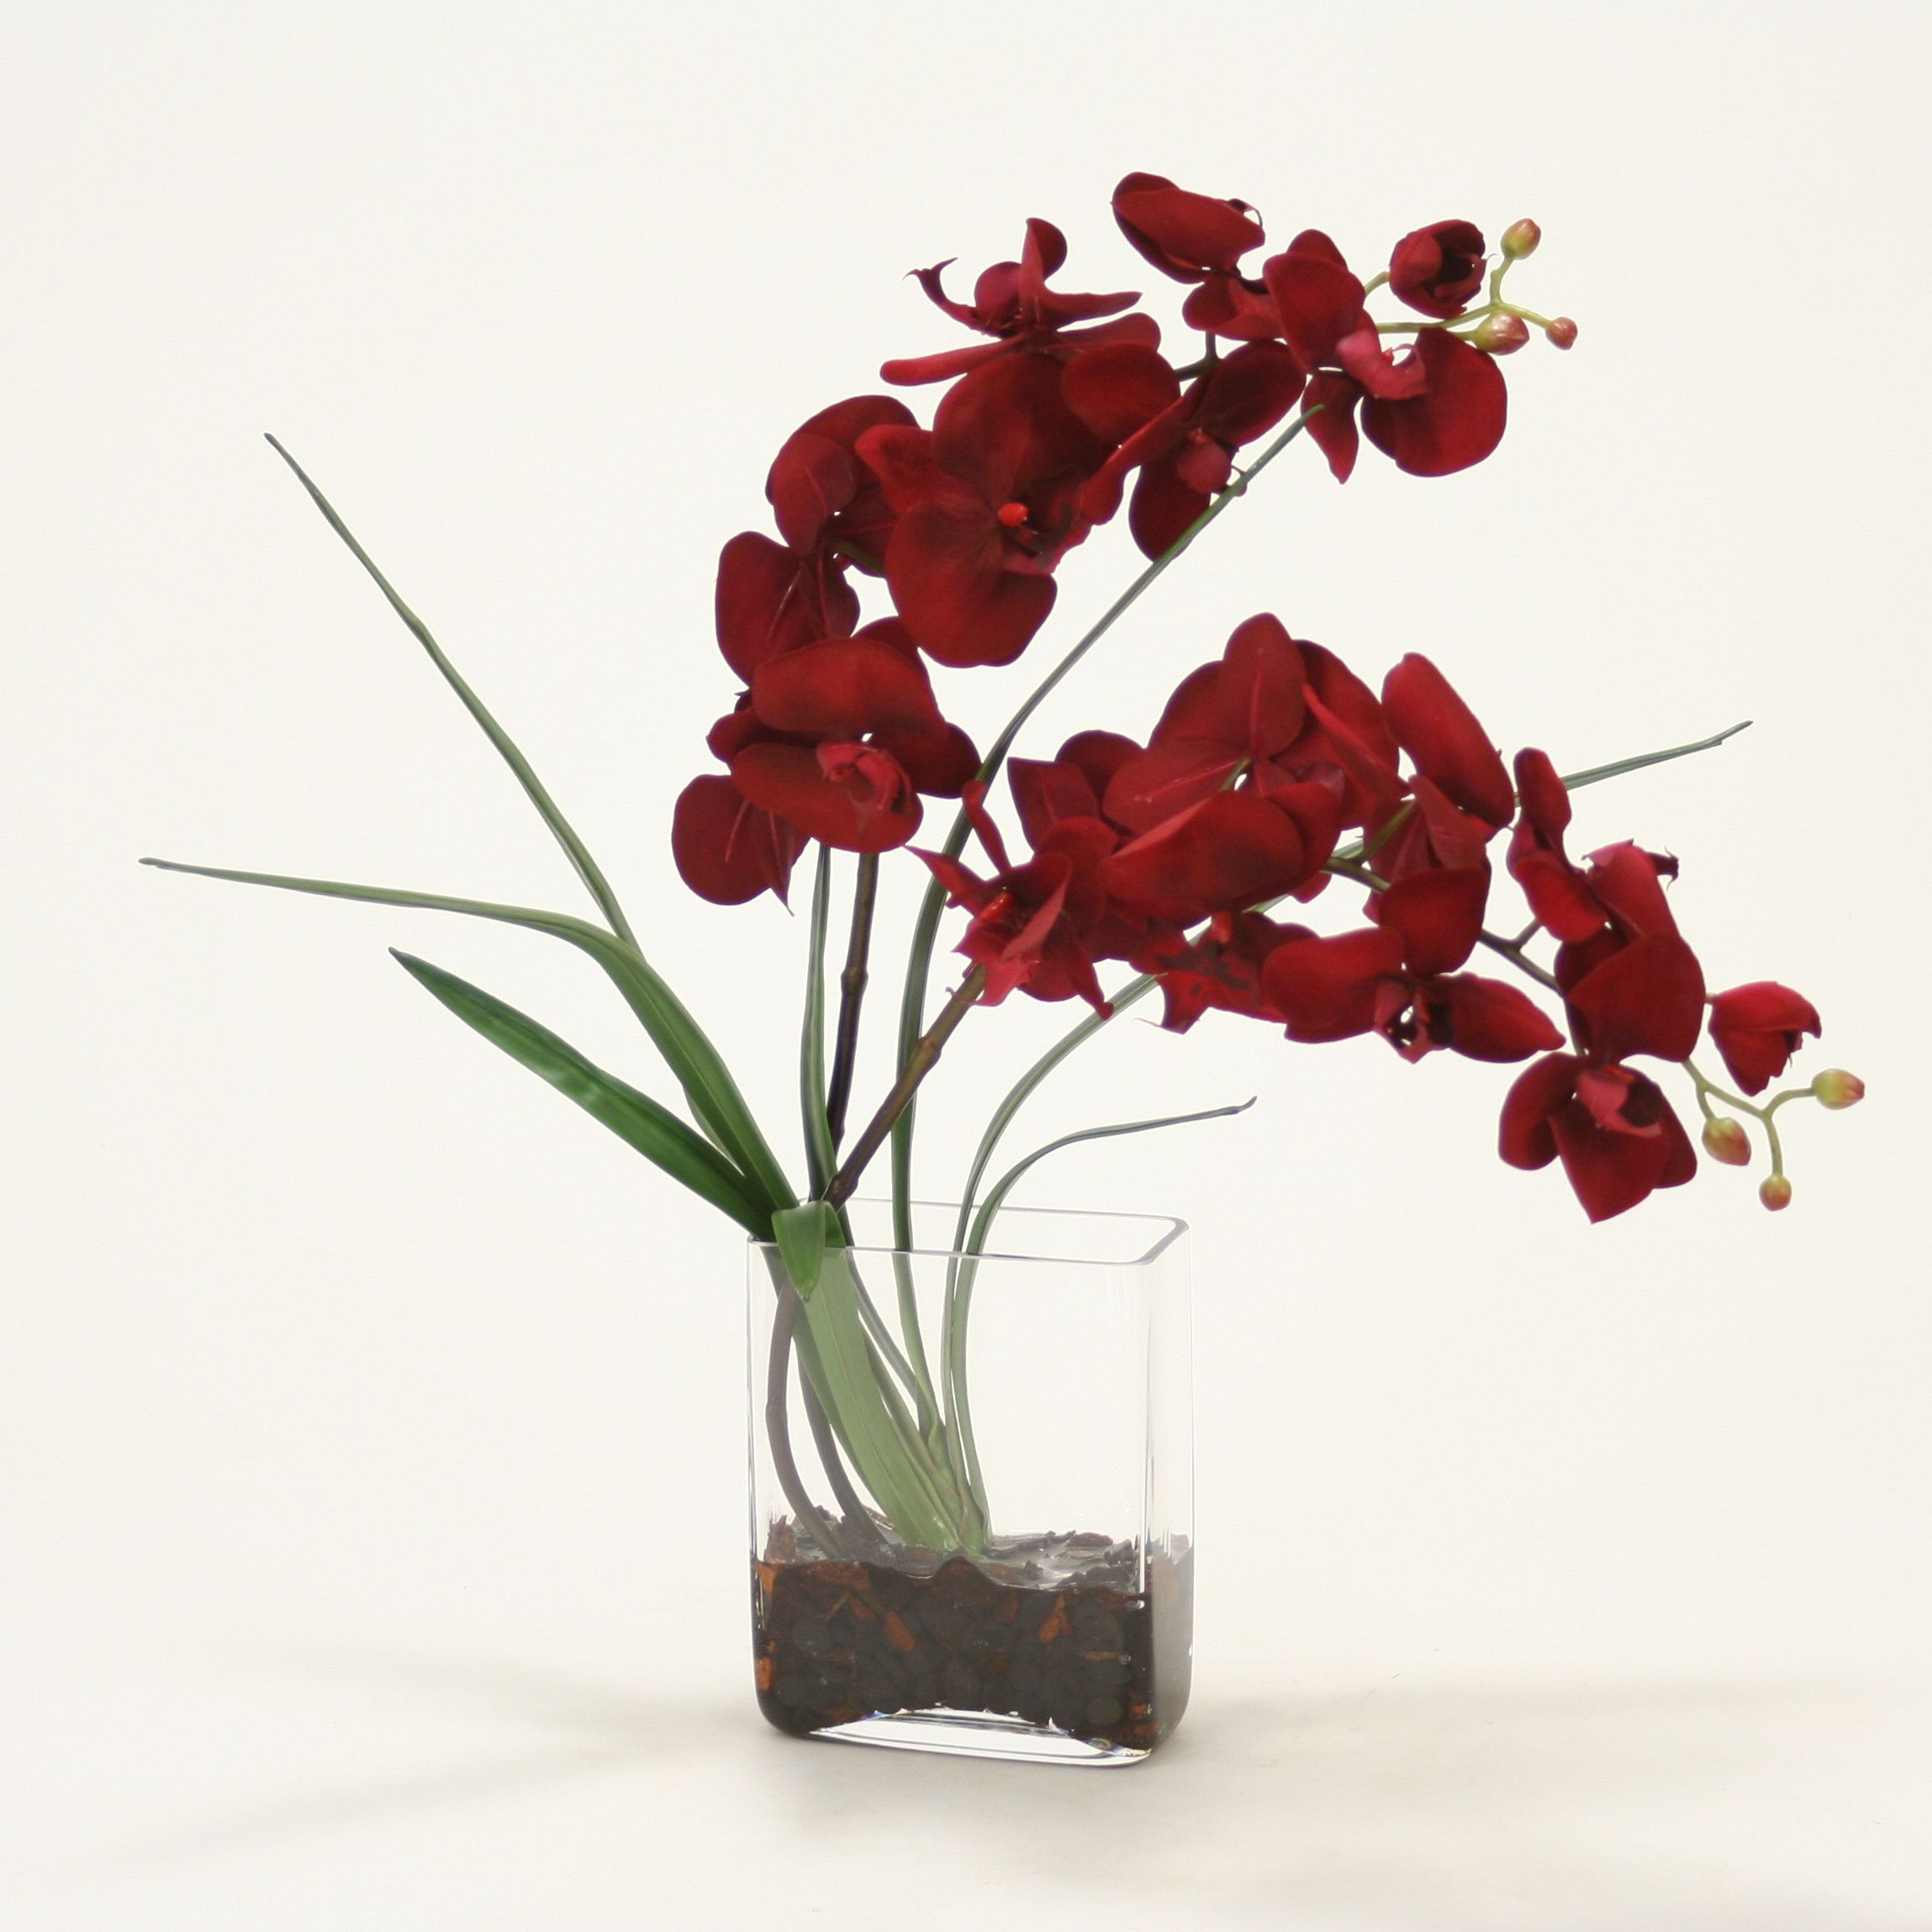 Distinctive Designs Phalaenopsis Orchid In Glass Vase